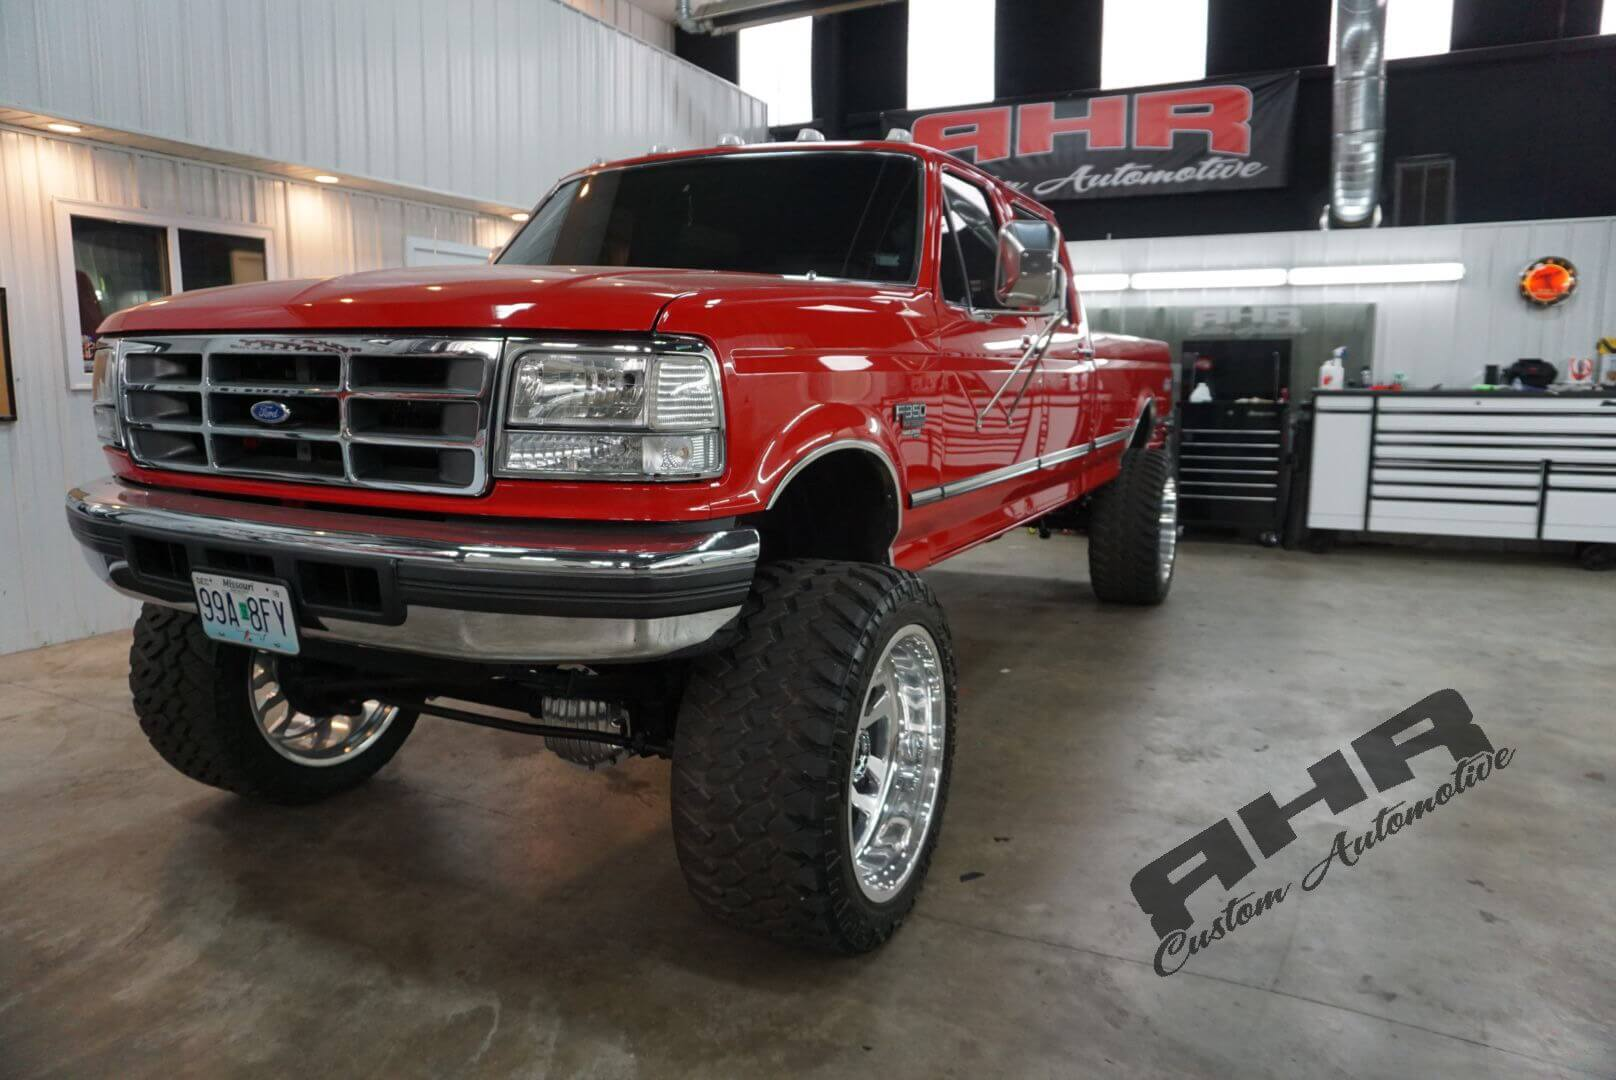 Fabtech Lift Kits >> Truck Lift Kits & Truck Leveling Kits | St. Louis Truck ...